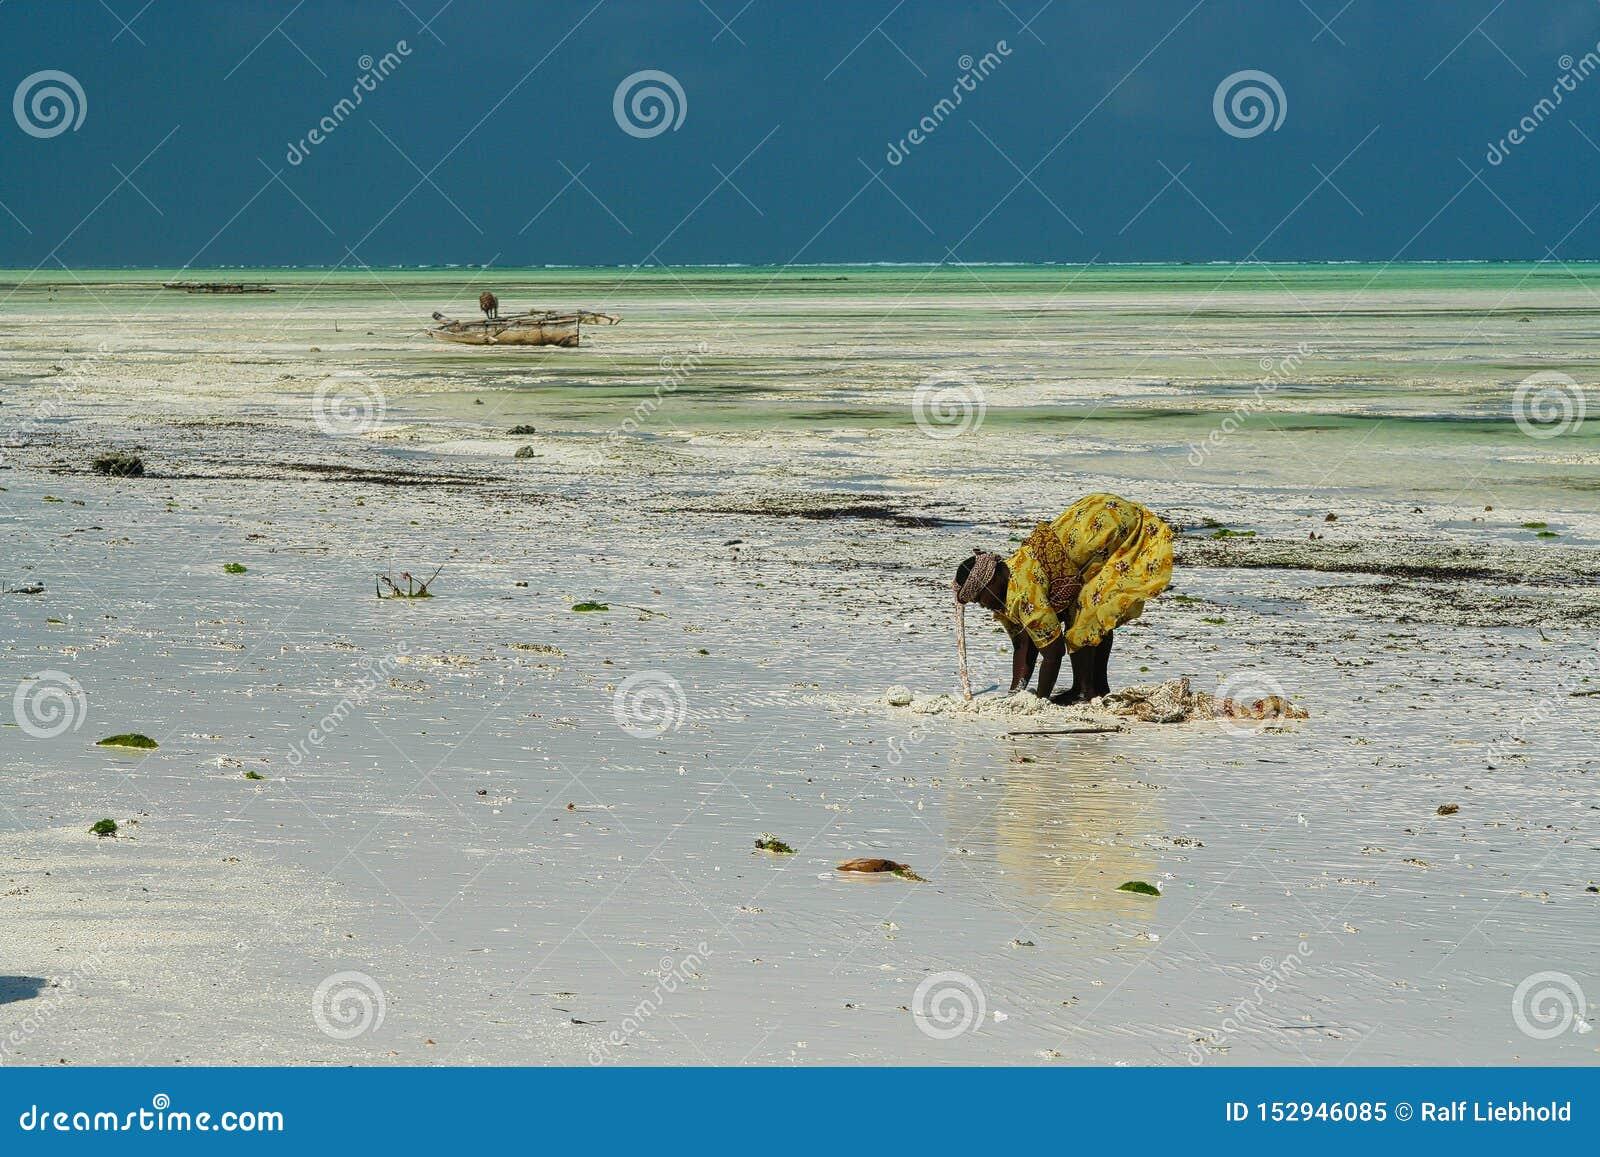 PAJE, ZANZIBAR - 17 ΔΕΚΕΜΒΡΊΟΥ 2007: Αφρικανική γυναίκα στα παραδοσιακά κίτρινα ενδύματα που ψάχνουν τα καβούρια και τα κοχύλια θ